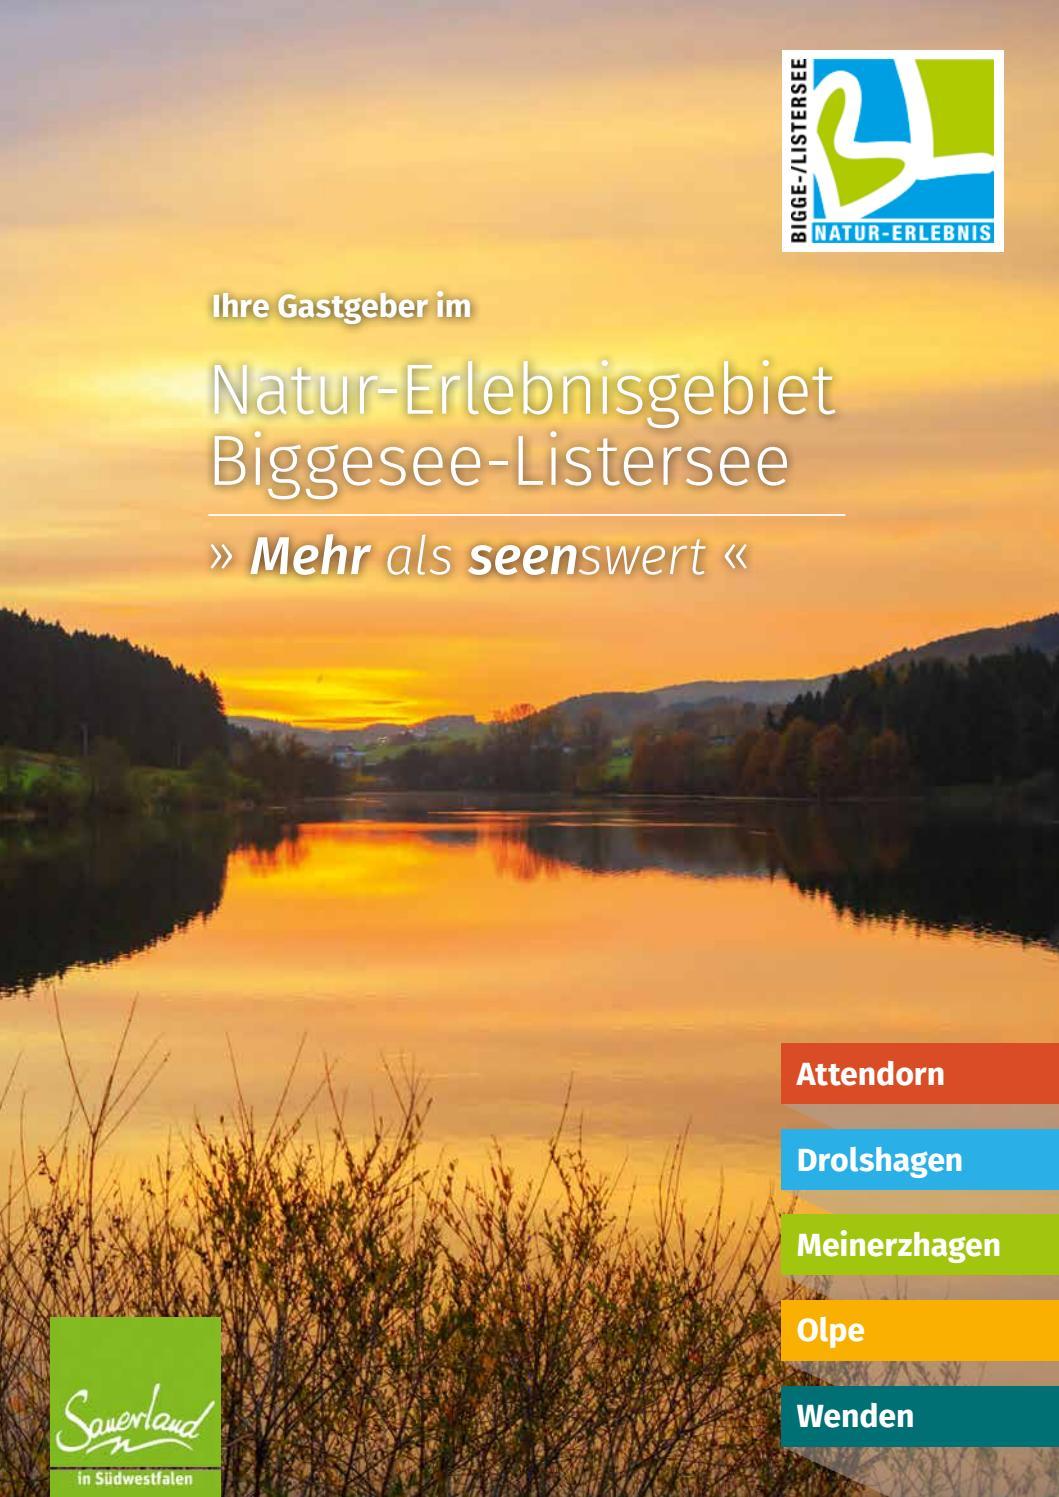 Gastgeberverzeichnis 2017 Biggesee Listersee By Frey Print